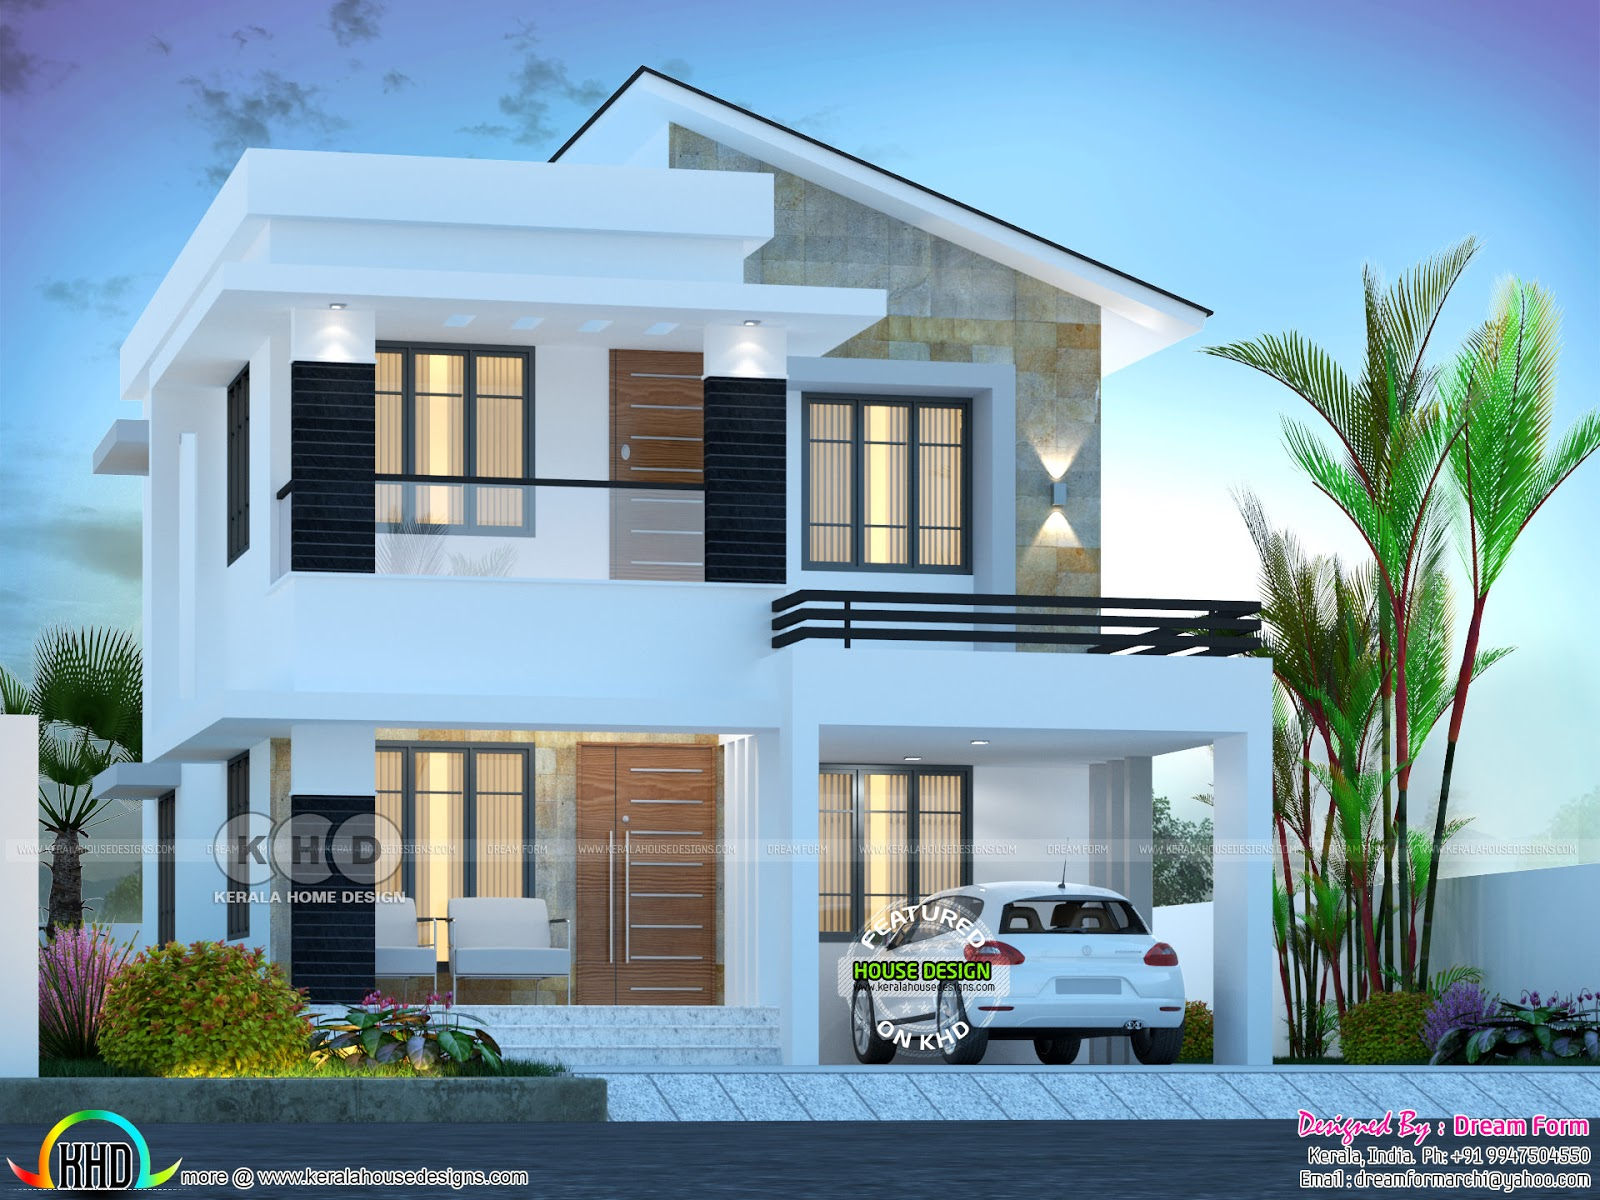 3 bedroom 1750 sq.ft beautiful modern home design - Kerala ...